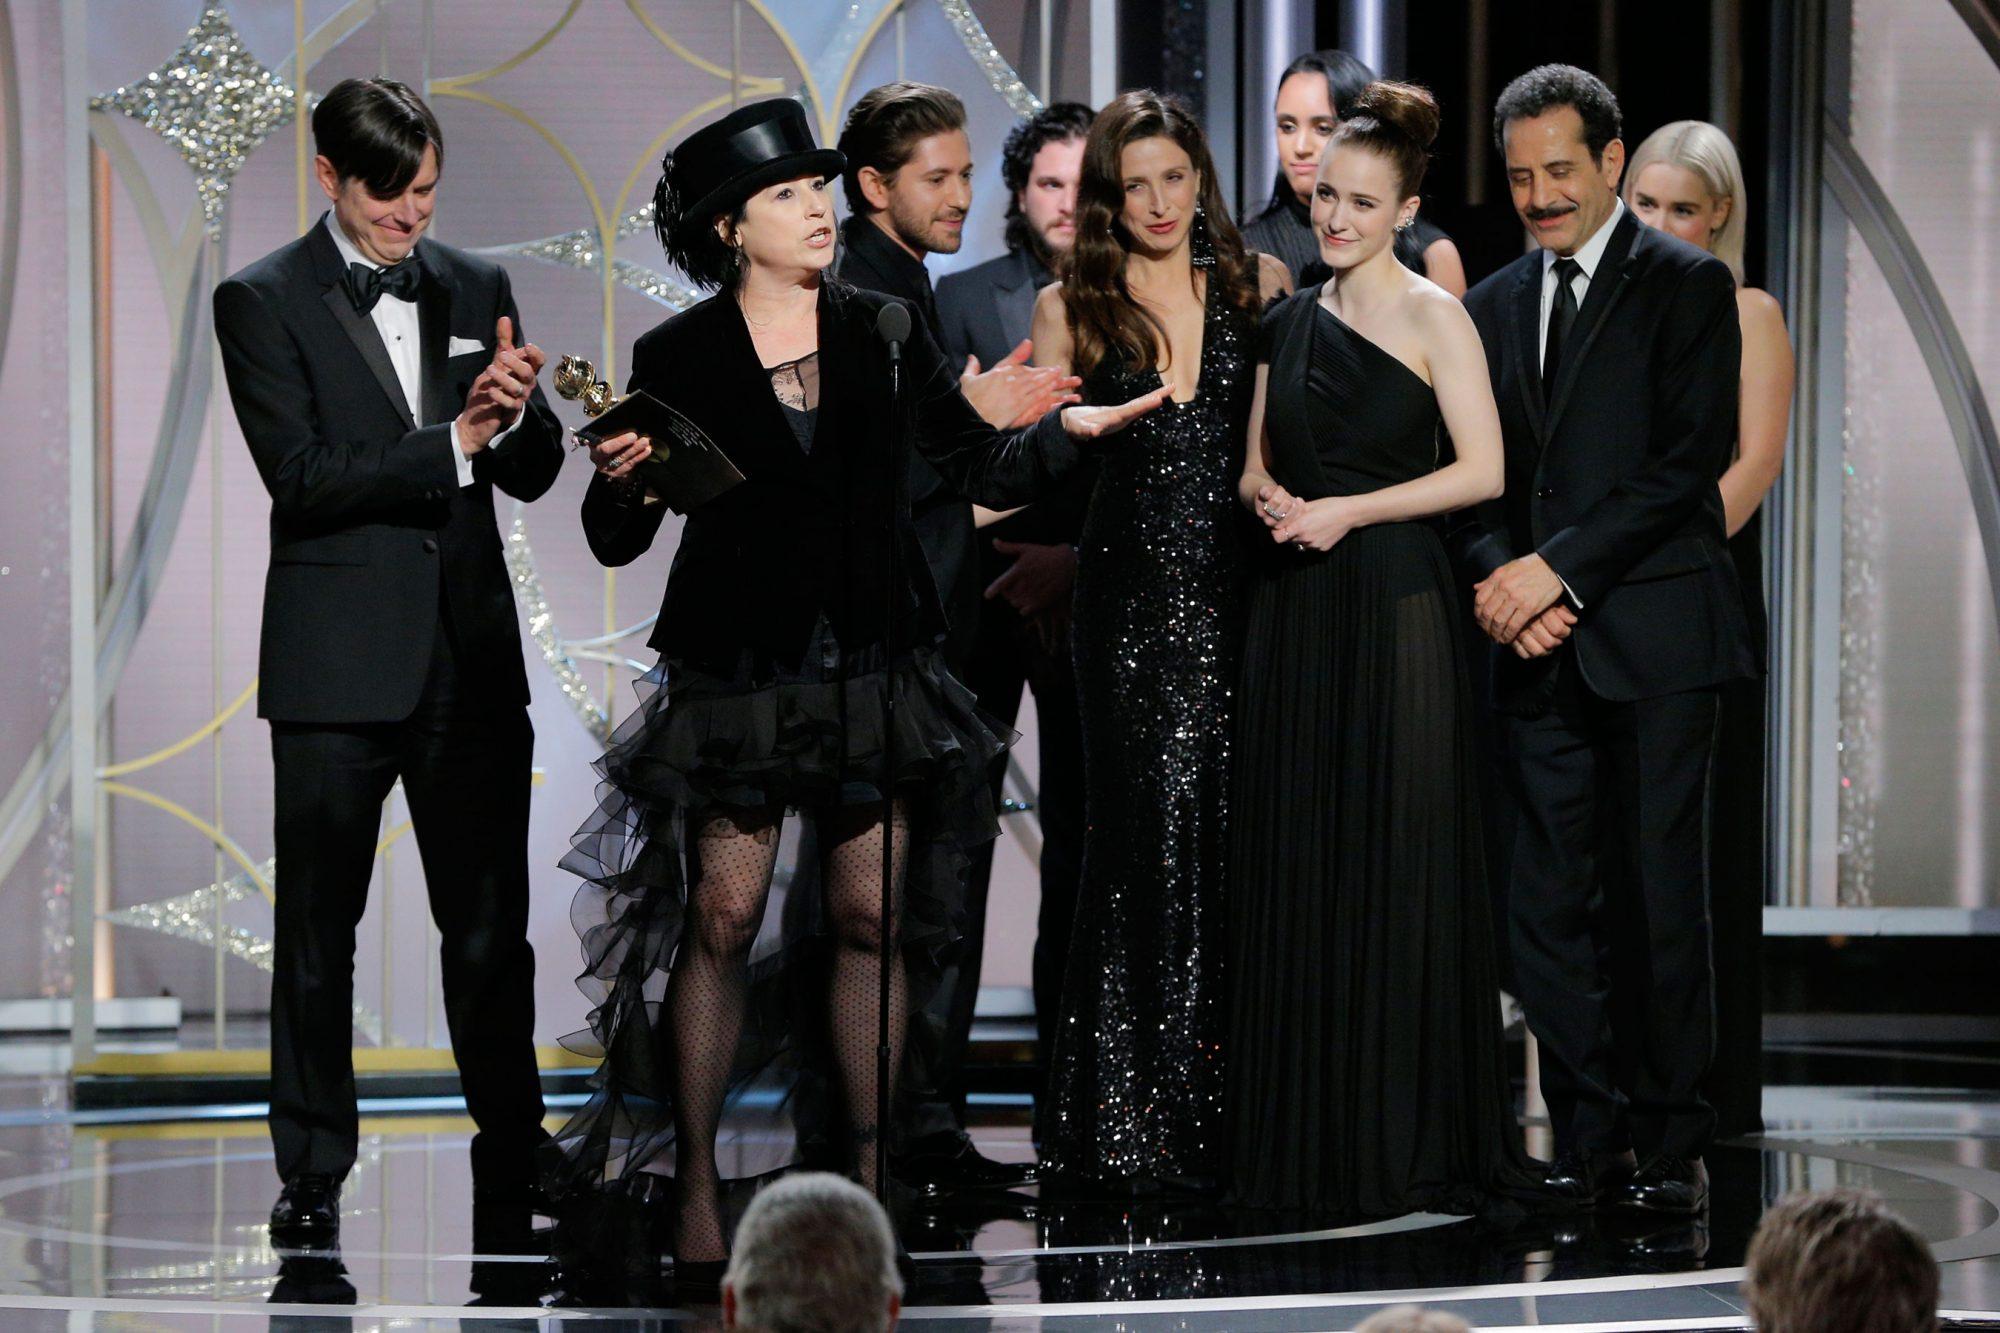 75th Annual Golden Globe Awards - Show